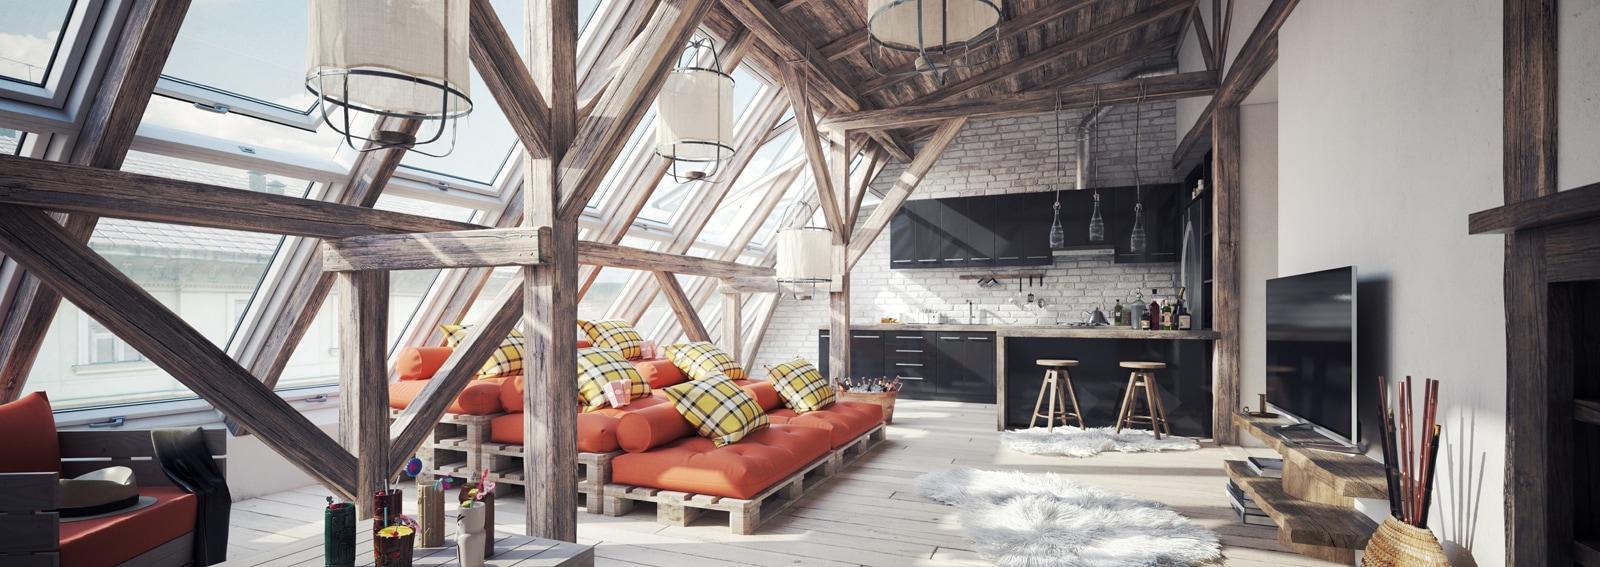 Cozy Scandinavian Attic Loft Interior Scene (Toned Image)